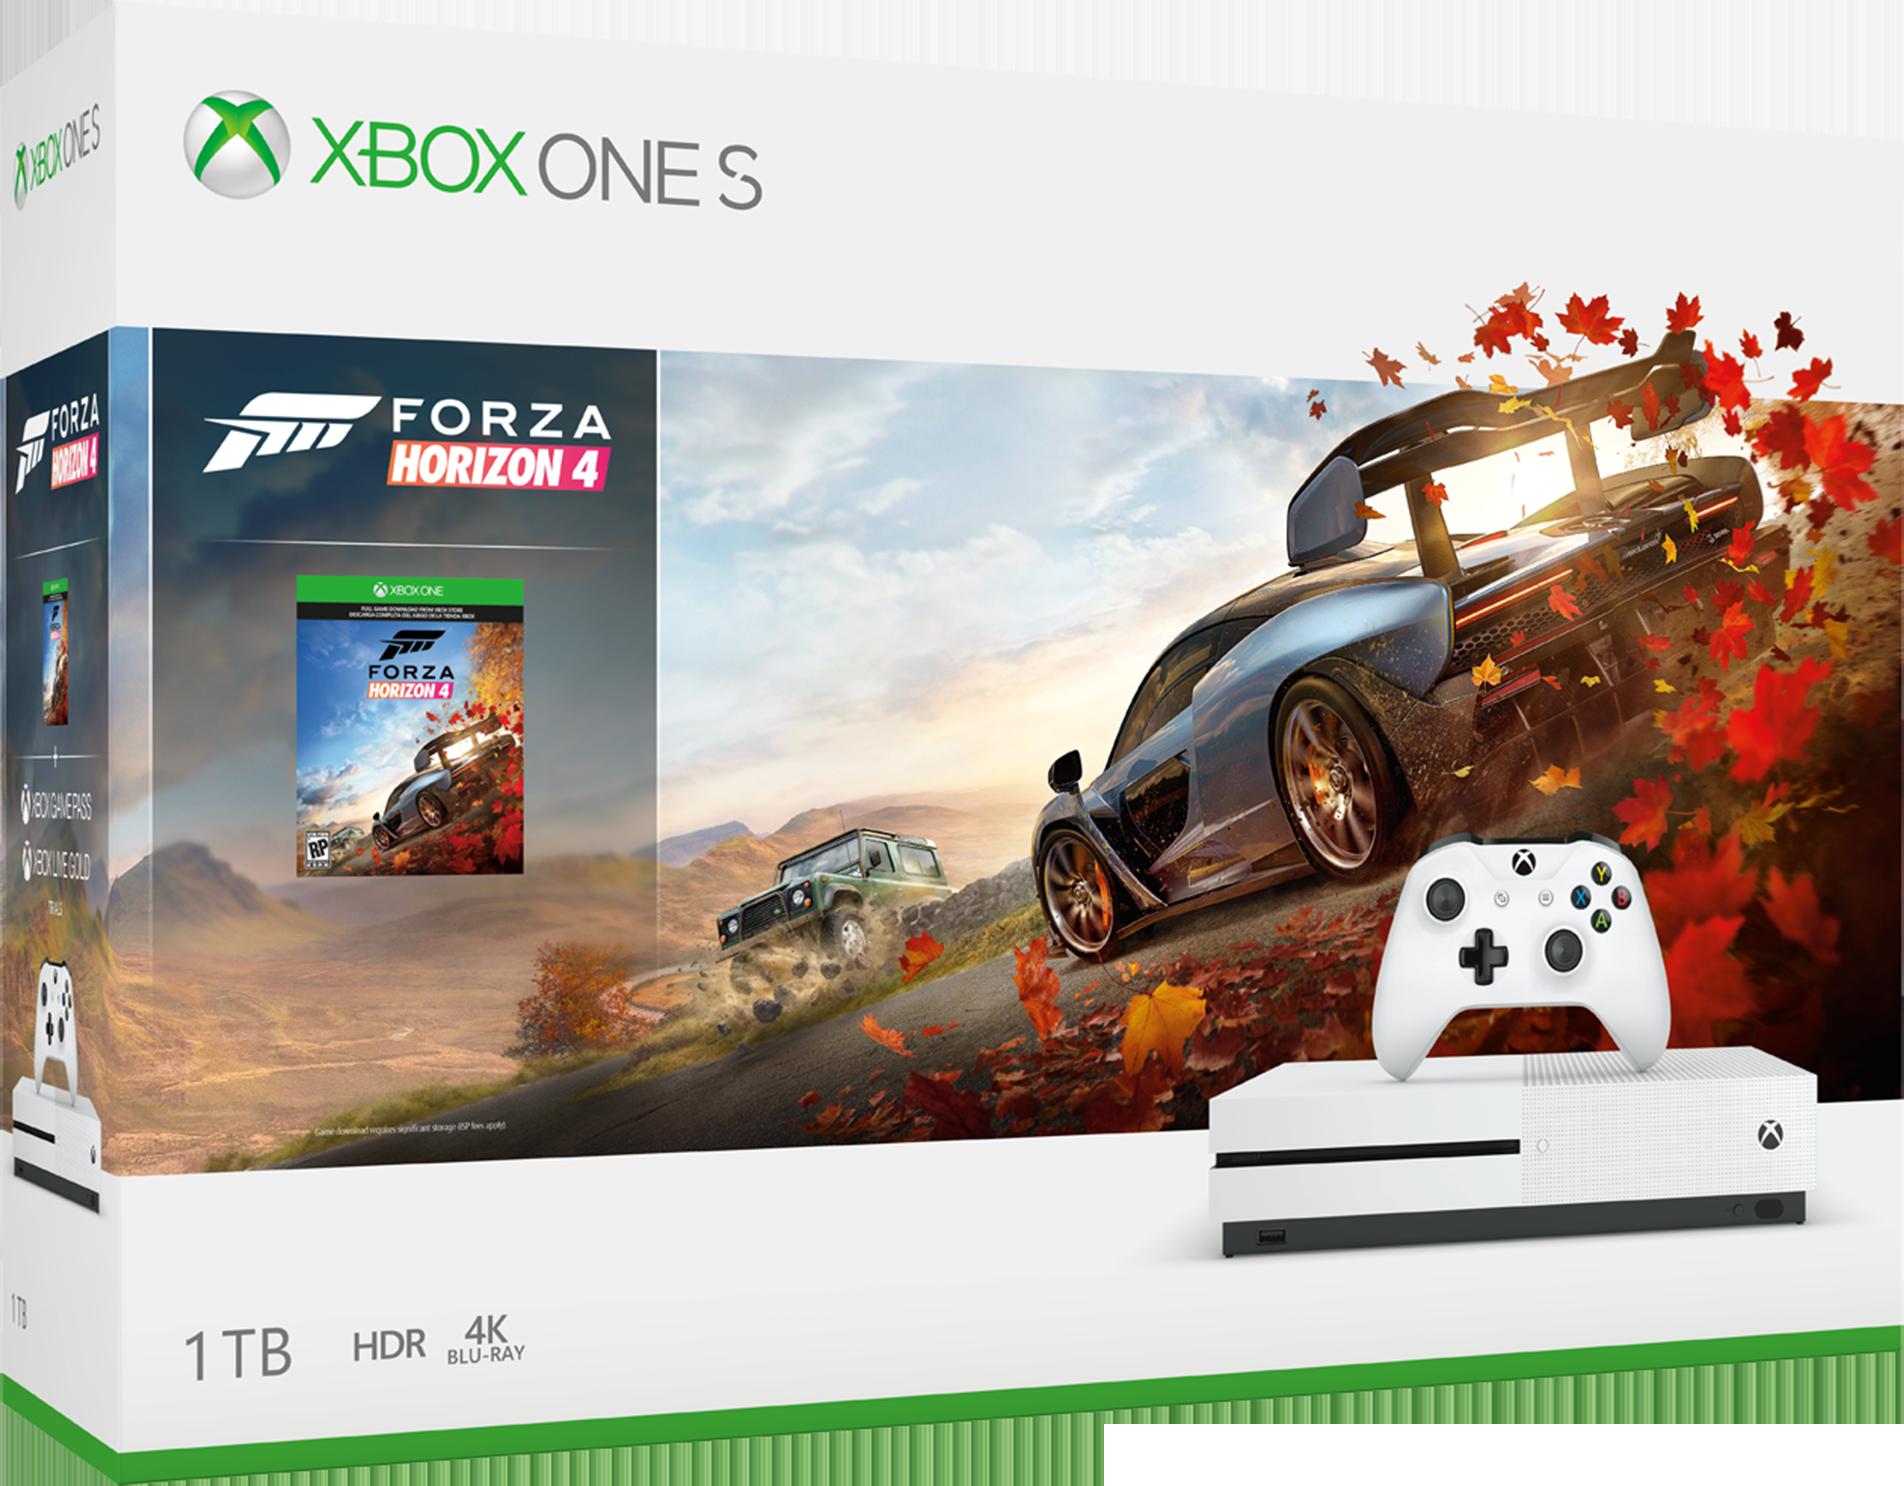 Xbox One S Forza Horizon 4 Bundle (1TB) – Xbox One